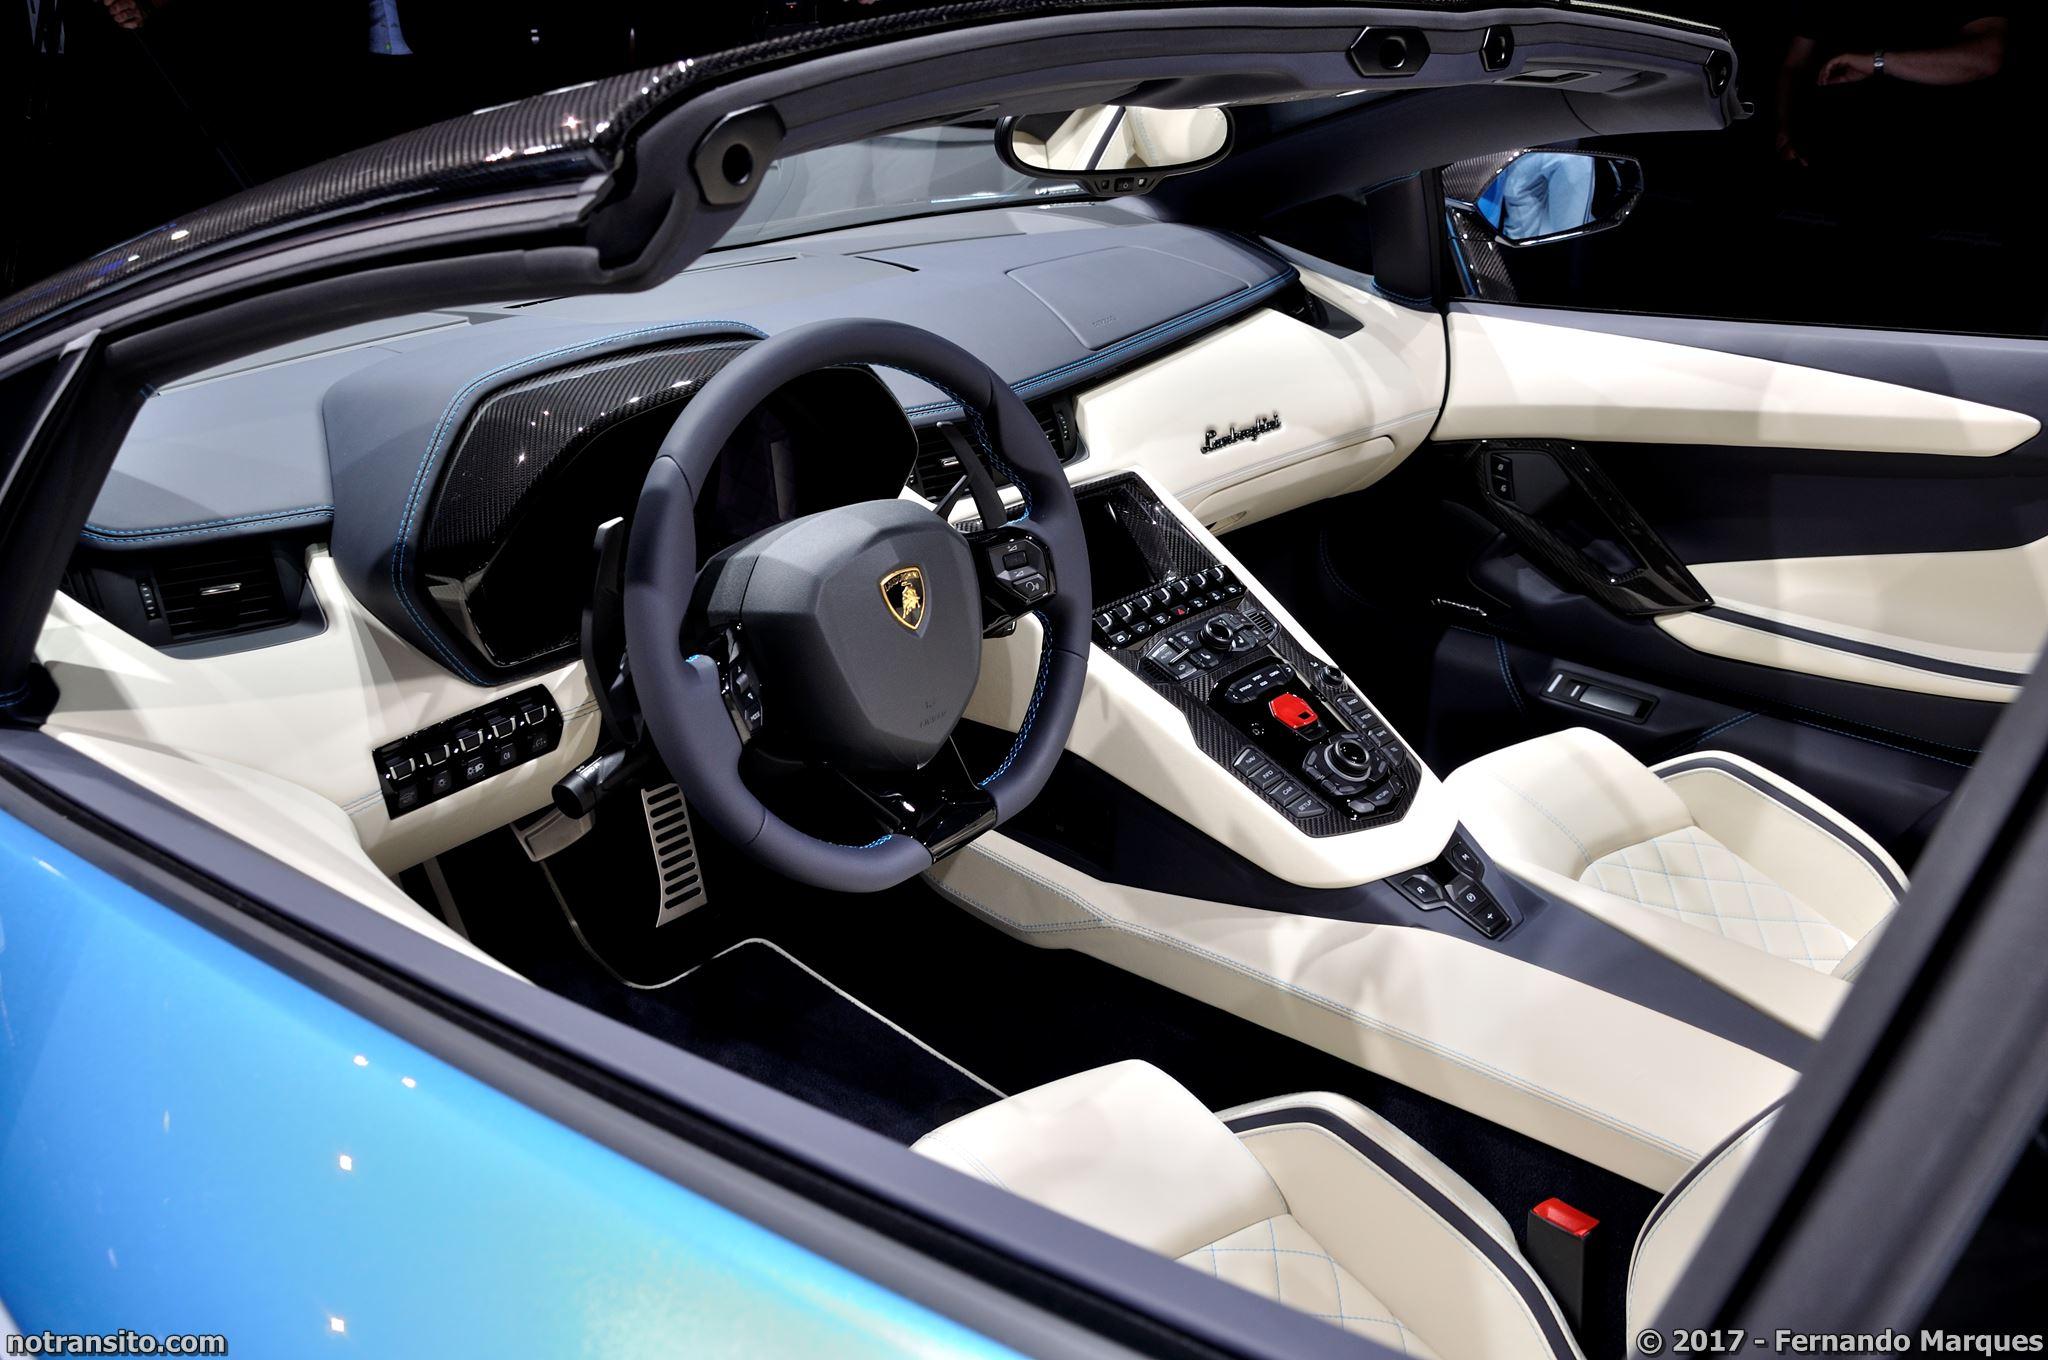 Lamborghini-Aventador-S-Roadster-Frankfurt-2017-006